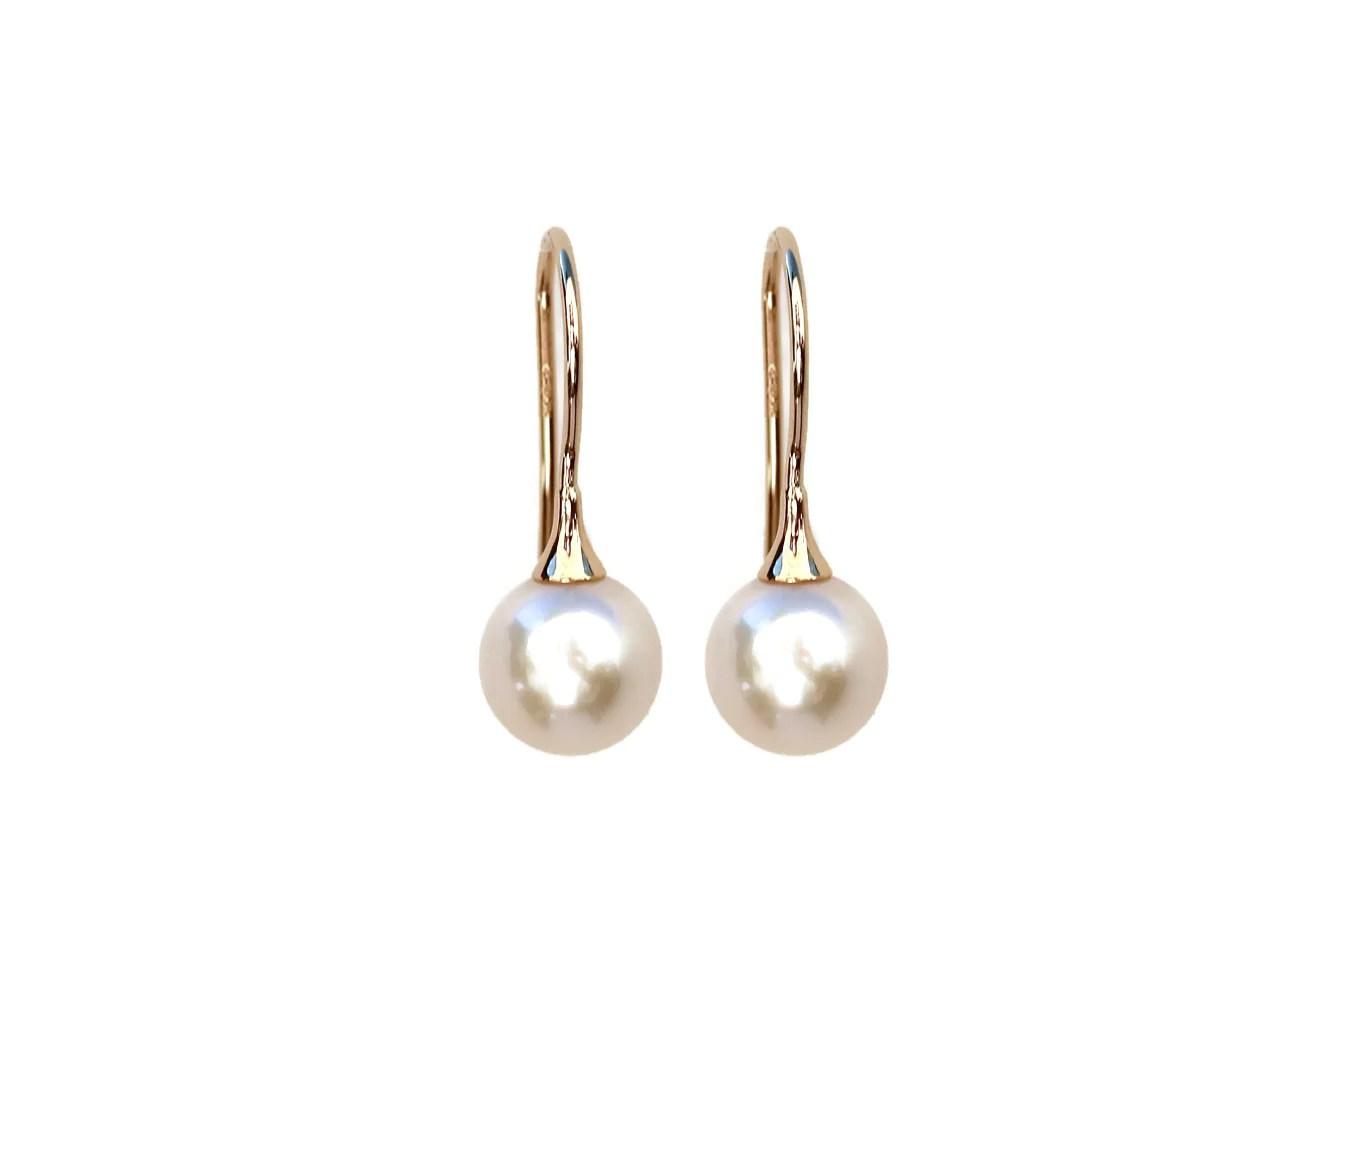 Adorable Stella Pearl Drop Earrings Stella Pearl Drop Earrings Pearl Drop Earrings Bridal Pearl Drop Earrings Silver wedding rings Pearl Drop Earrings